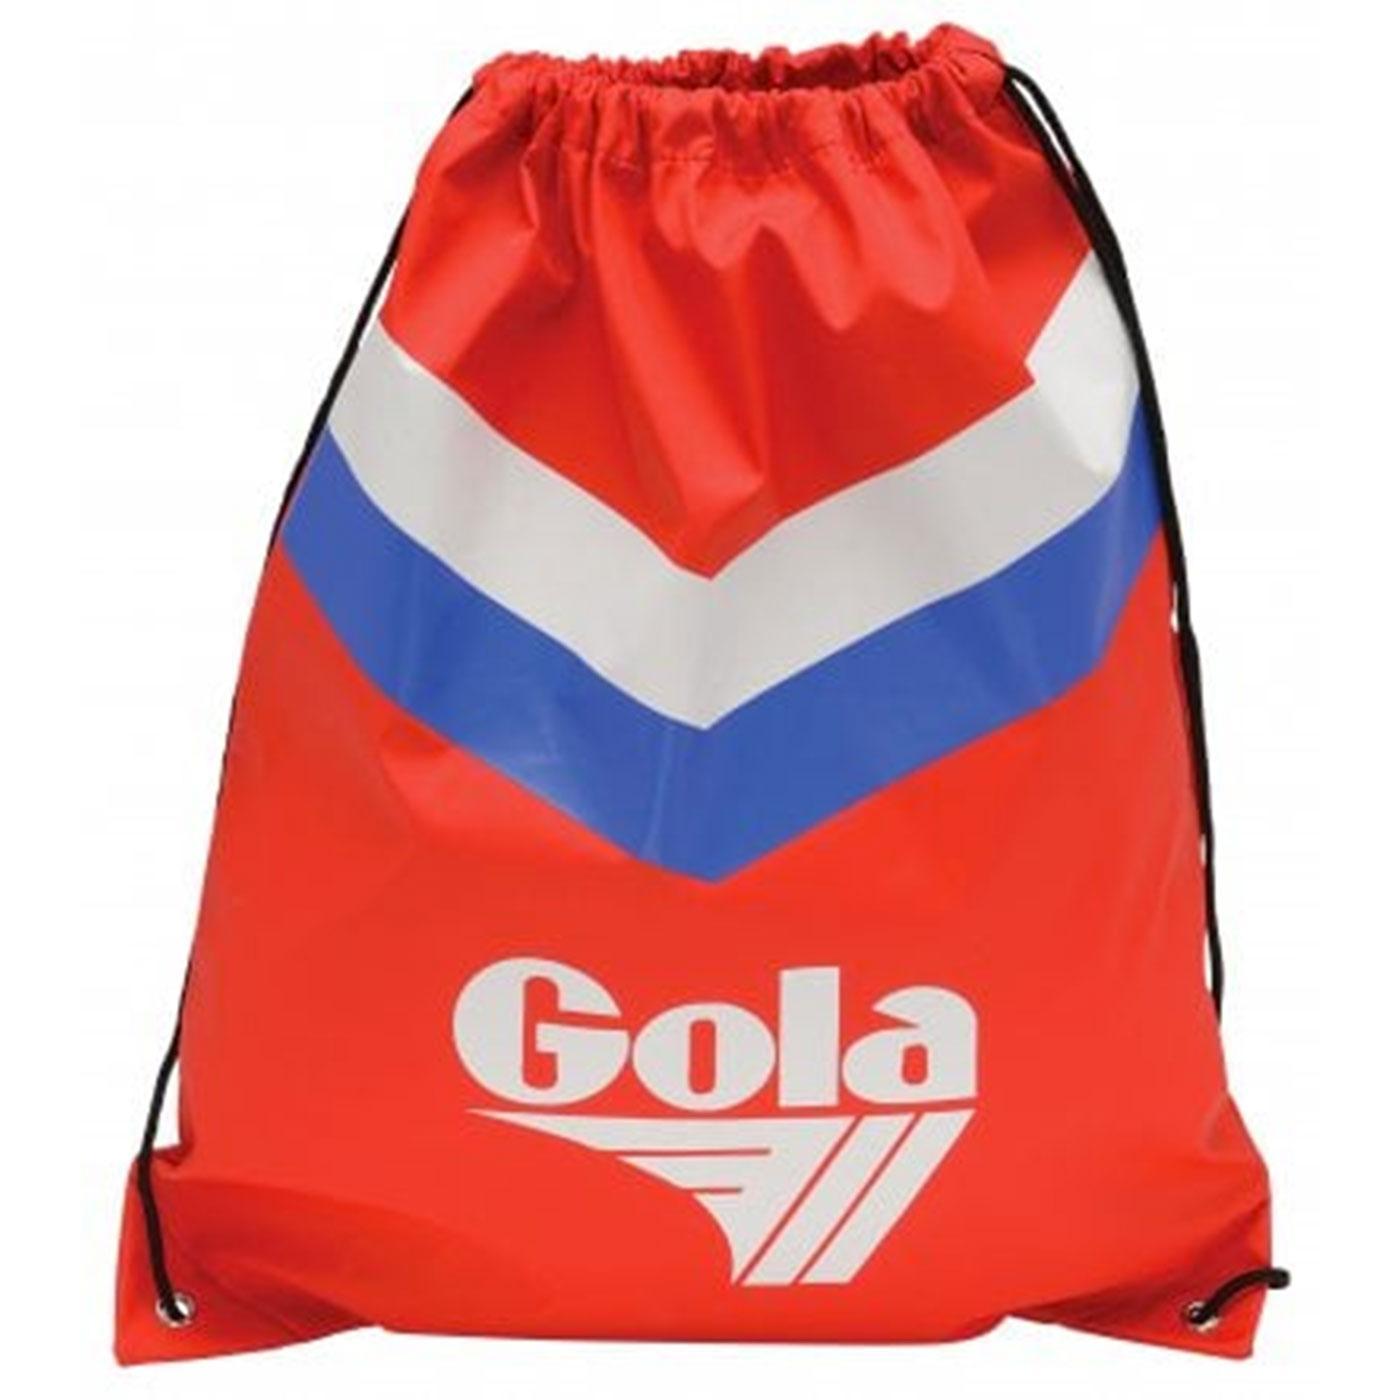 Hicks GOLA Chevron Retro 1970s Duffle Bag (Red)